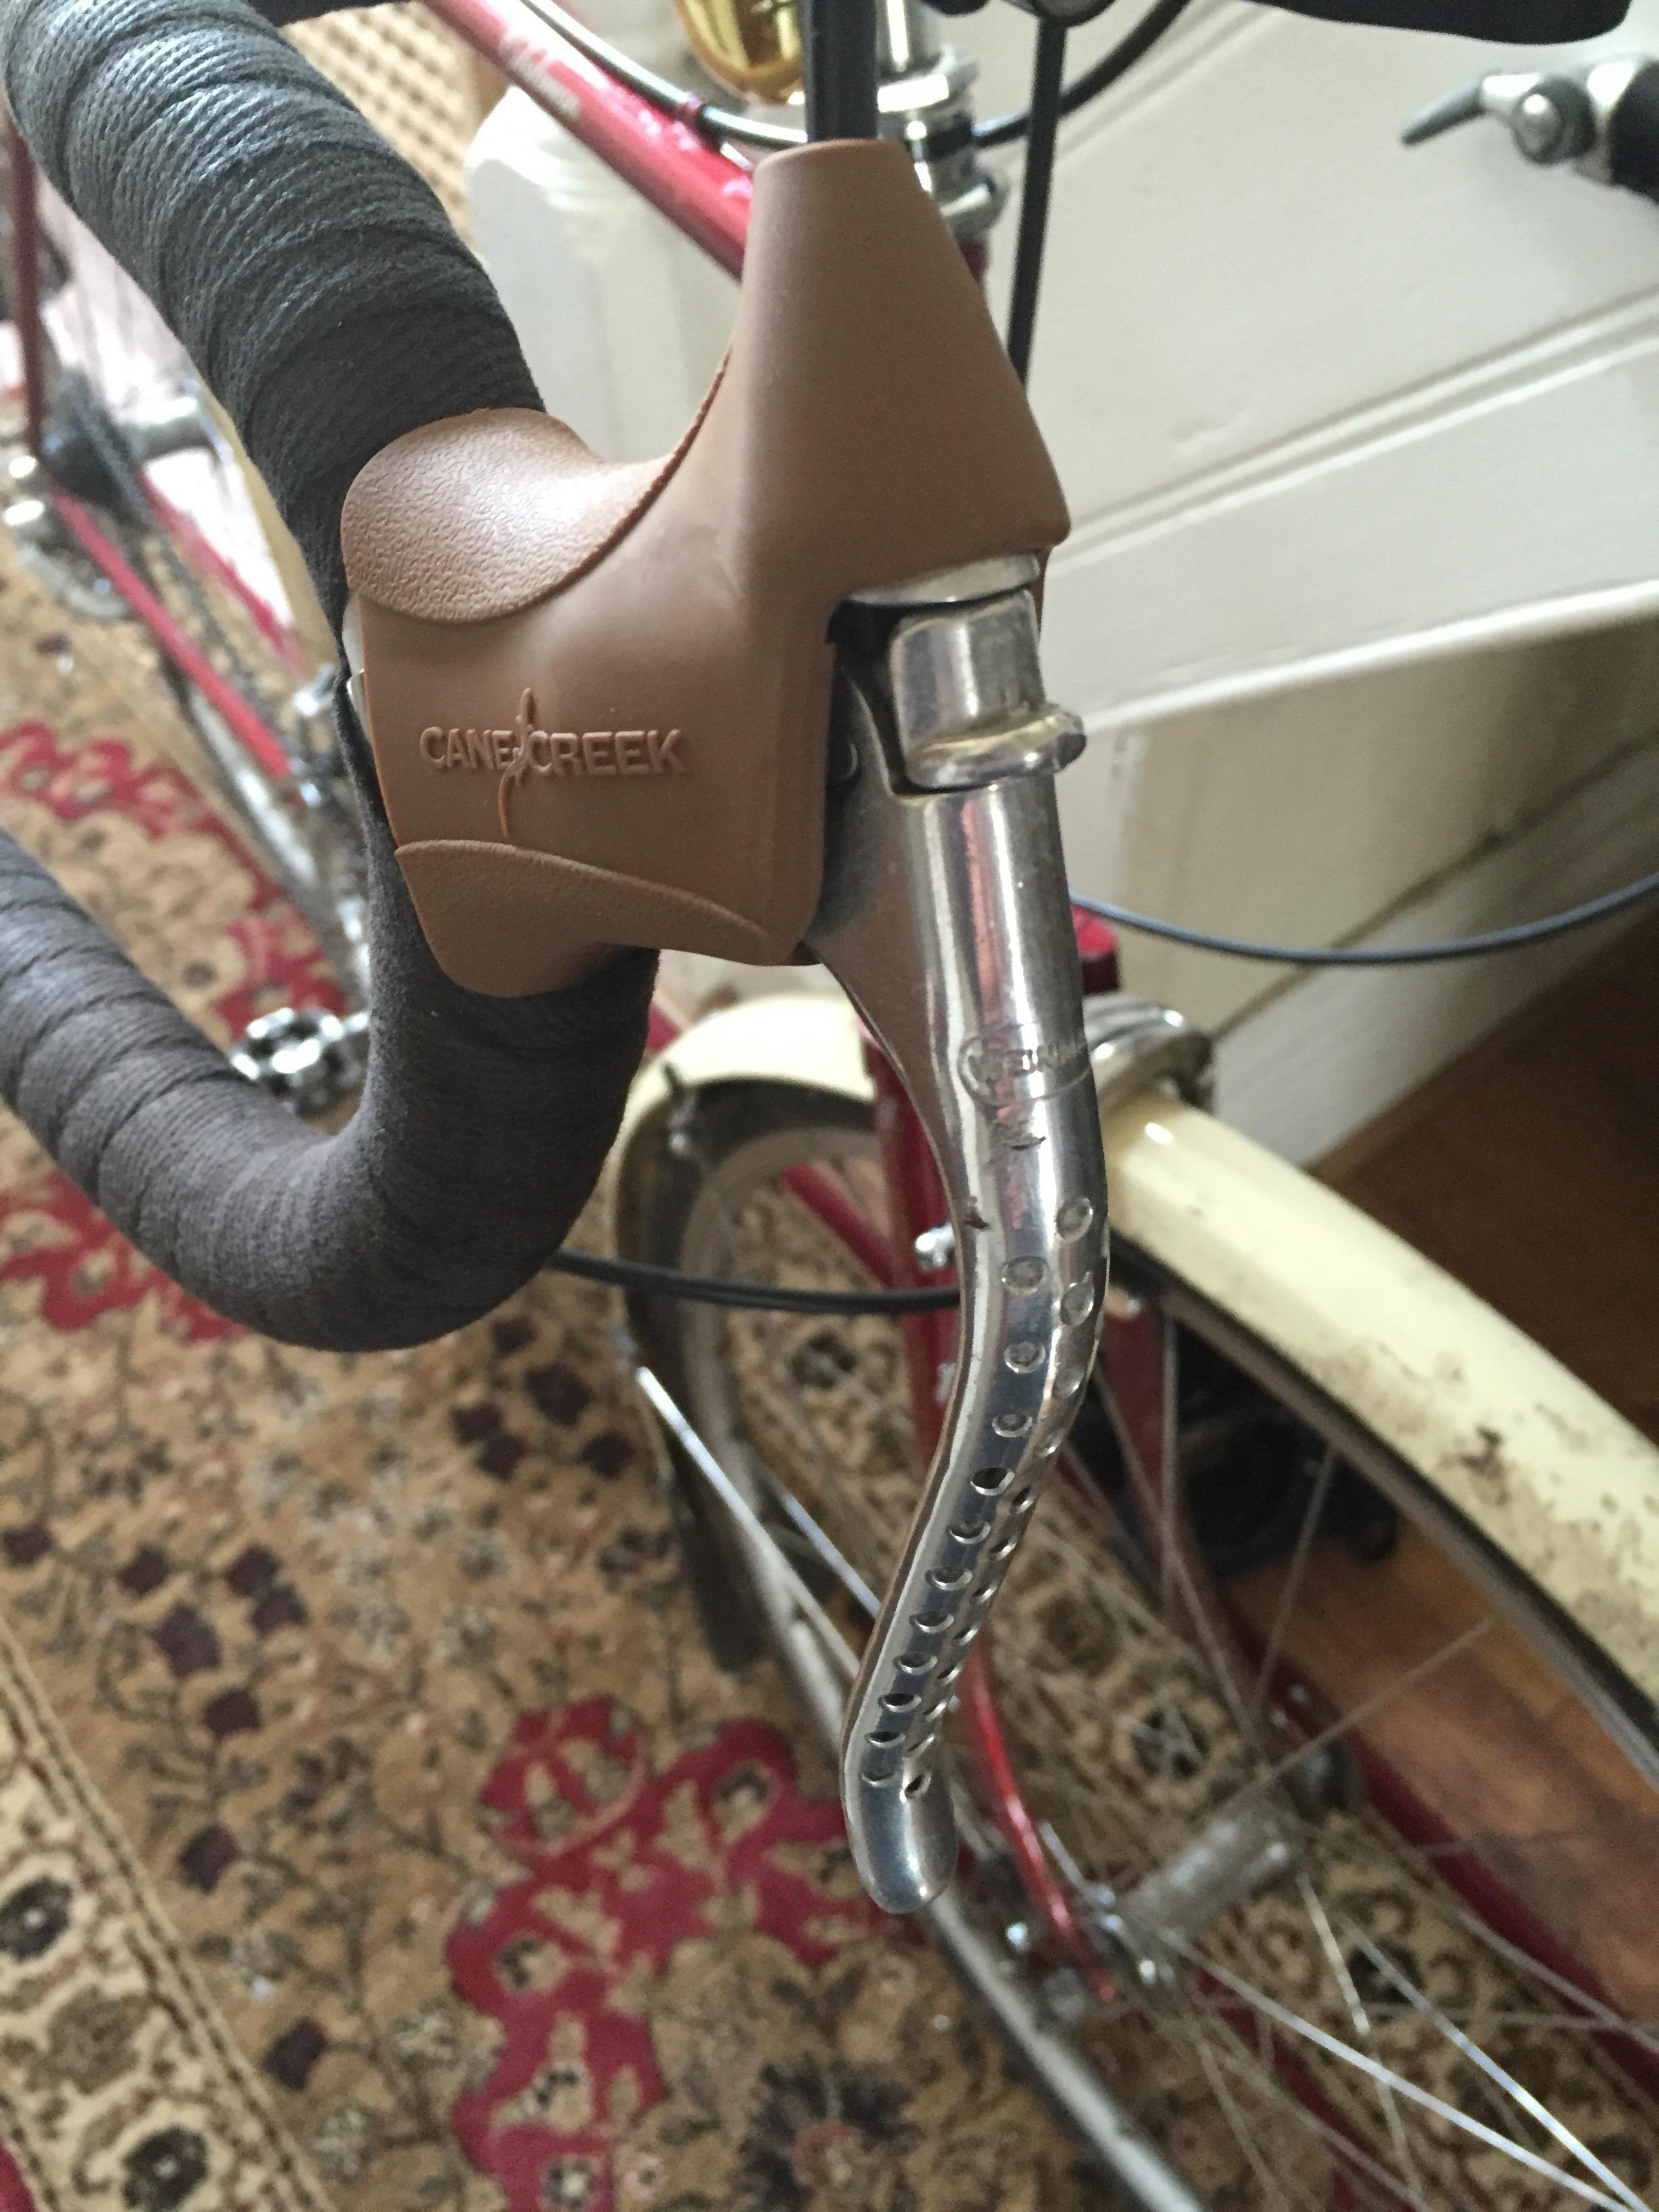 bike bicycle system hoods New Dia-Compe Non-Aero Brake Lever Hood Black